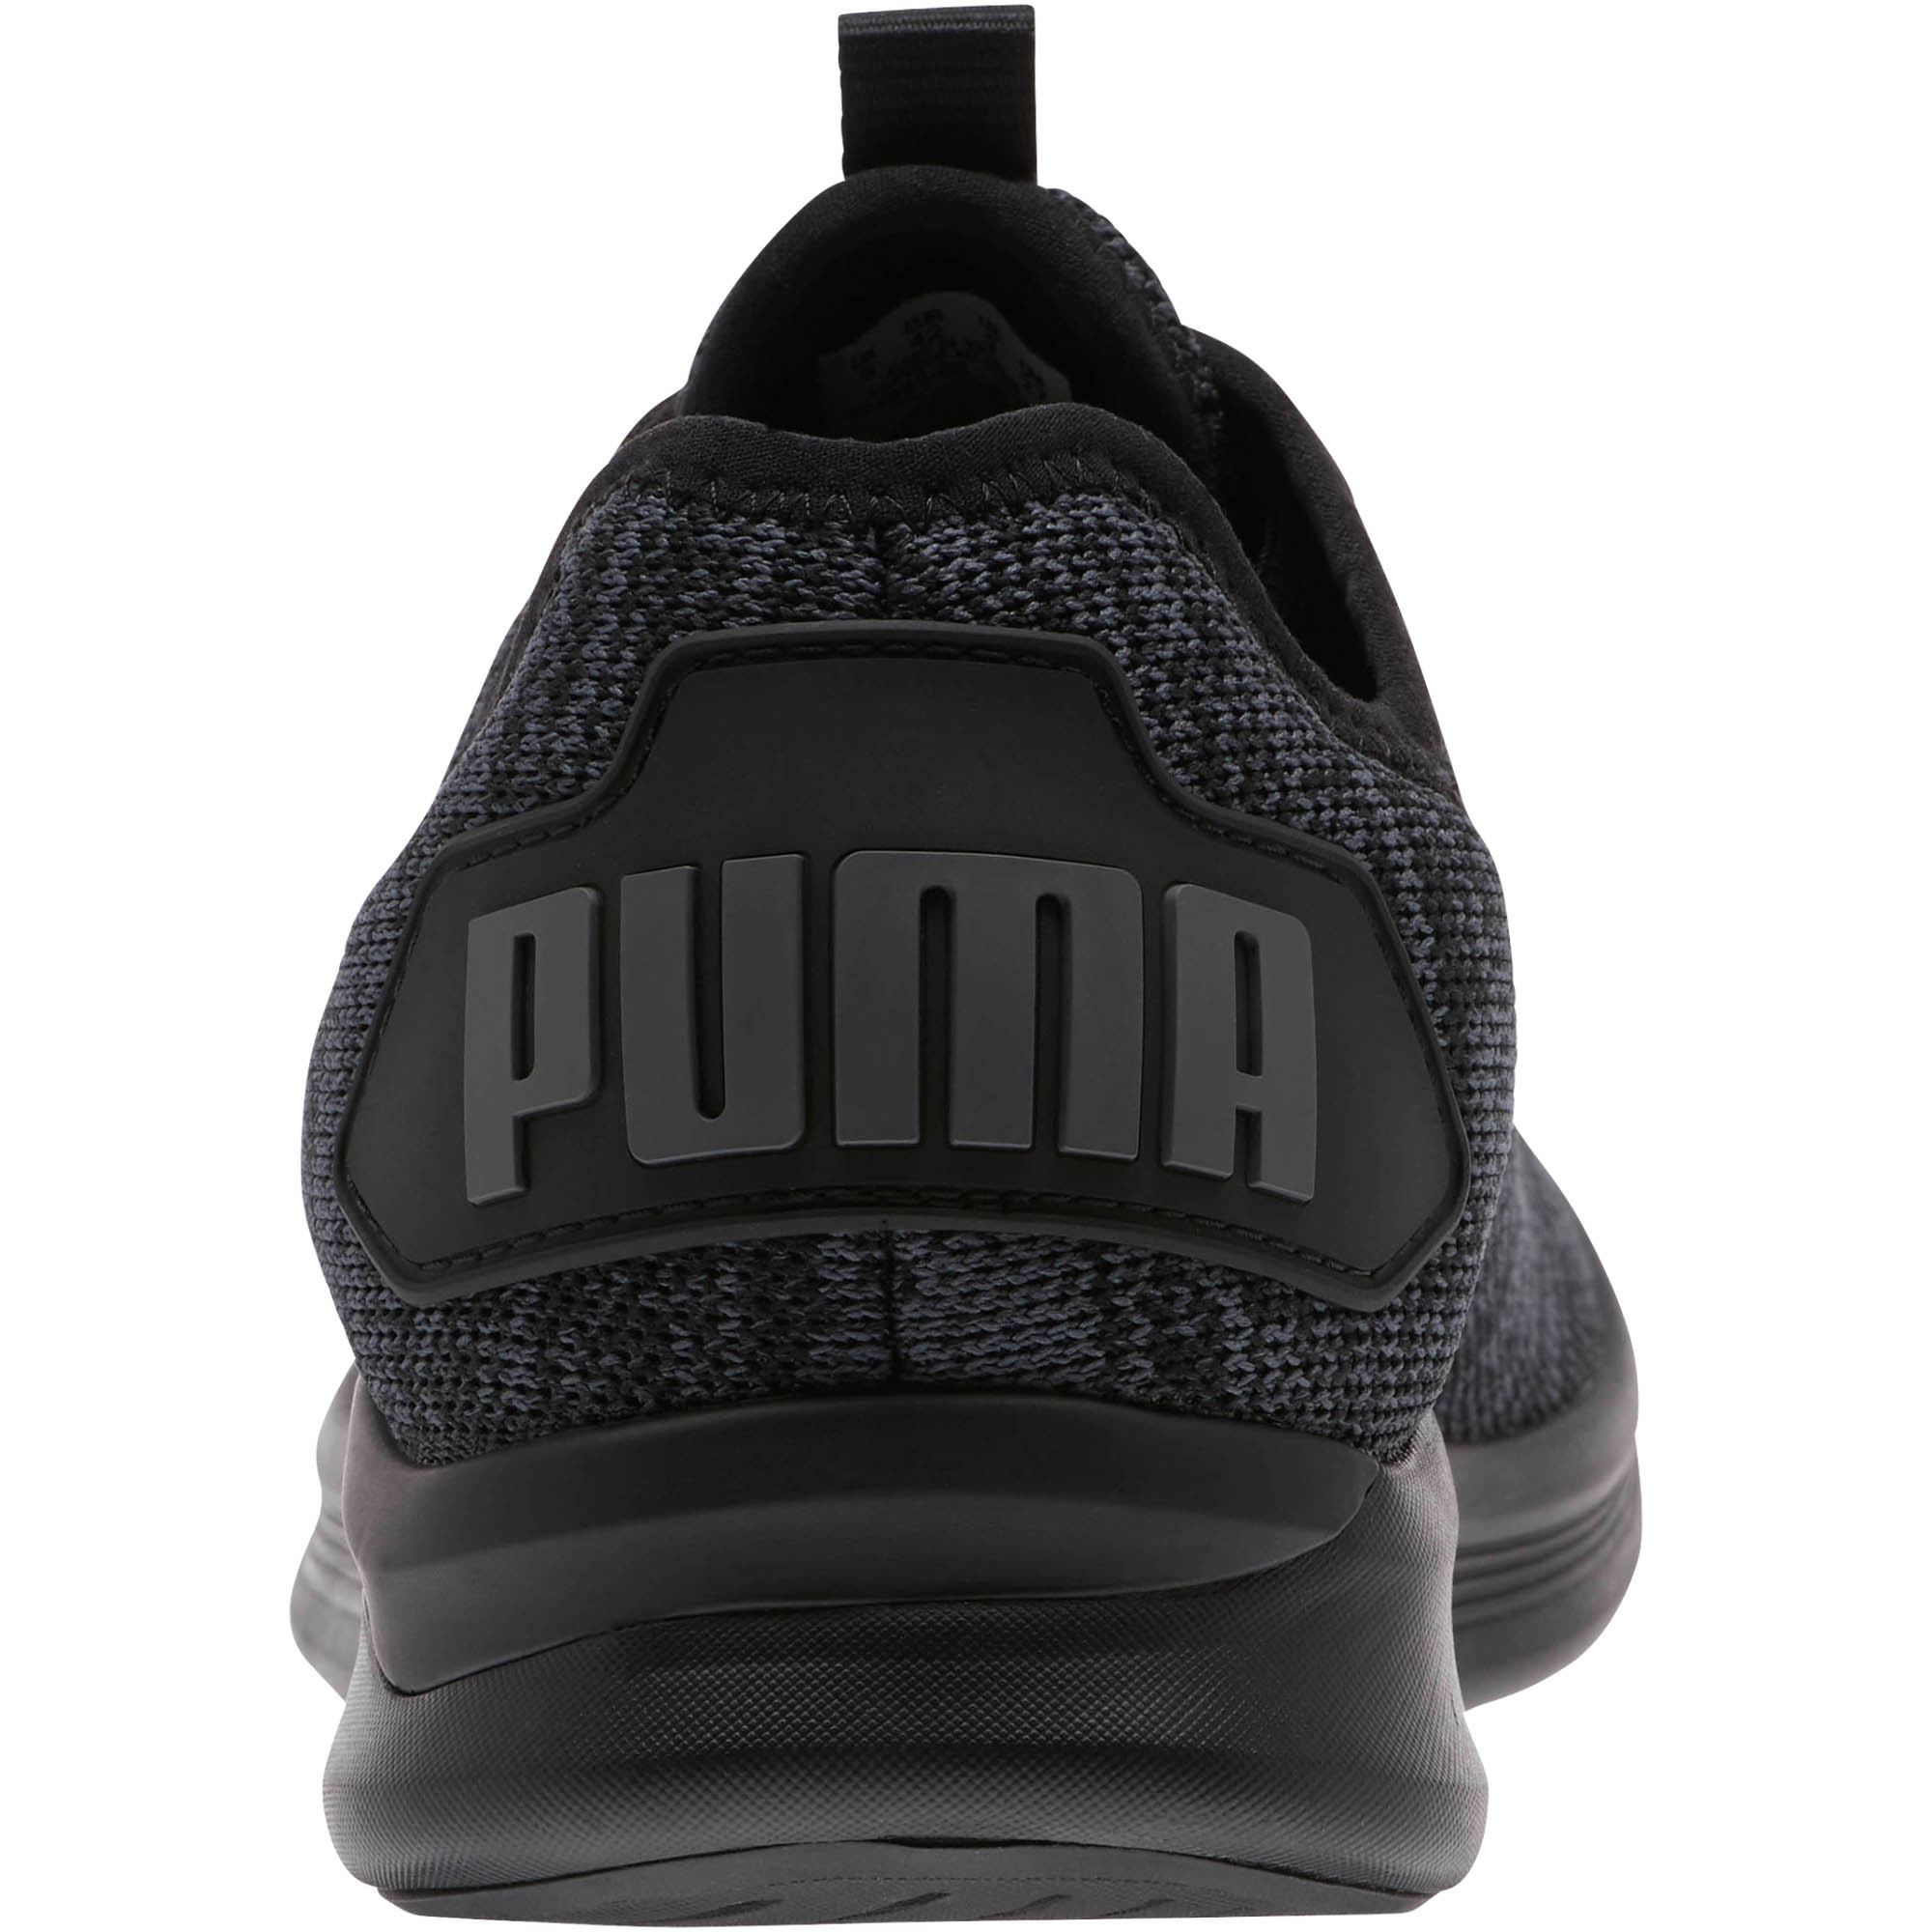 PUMA-Ballast-Men-039-s-Running-Shoes-Men-Shoe-Running miniatura 15